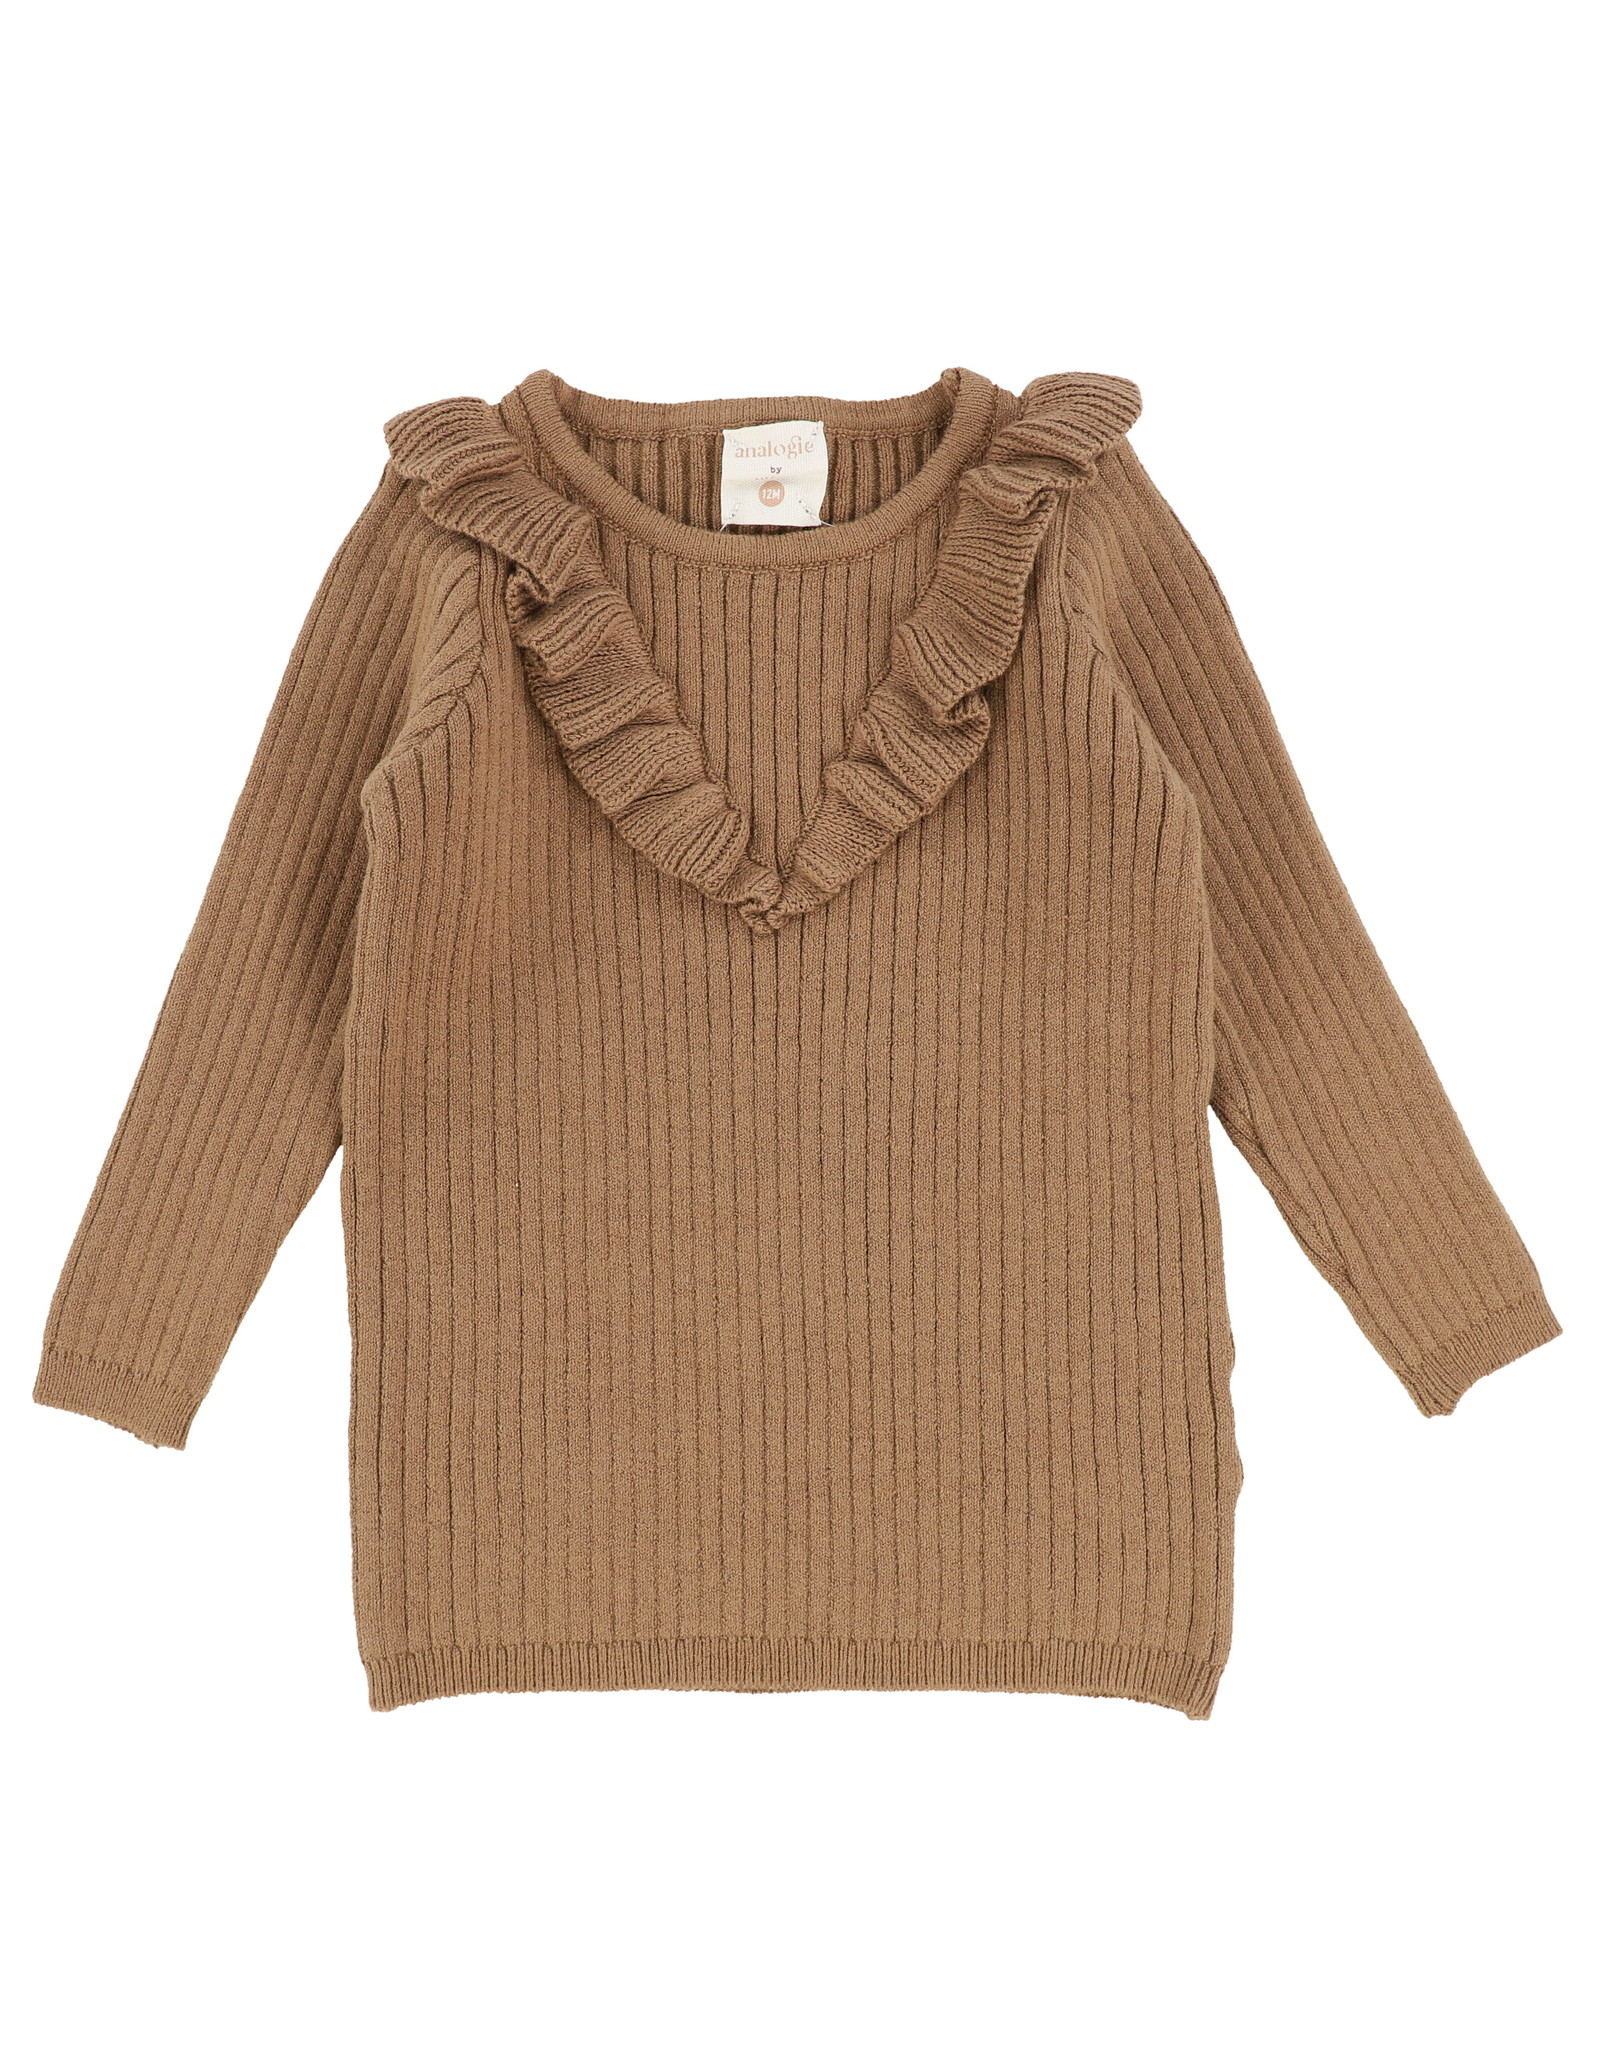 Analogie Analogie Ruffle Sweater